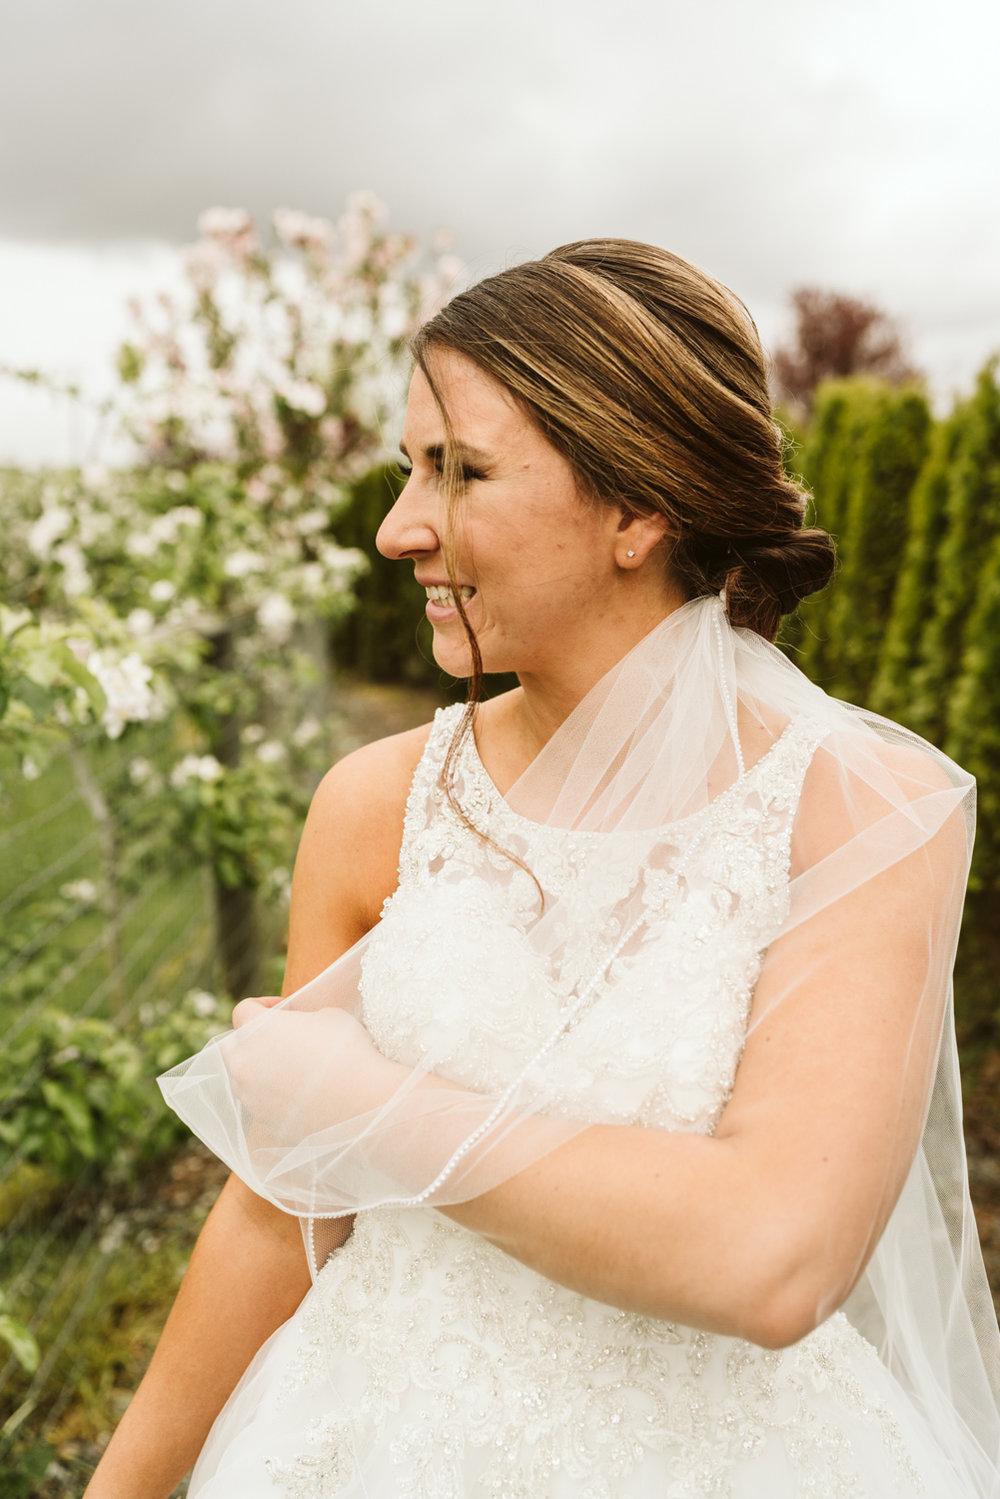 April Yentas Photography - jen and anthony wedding-36.jpg